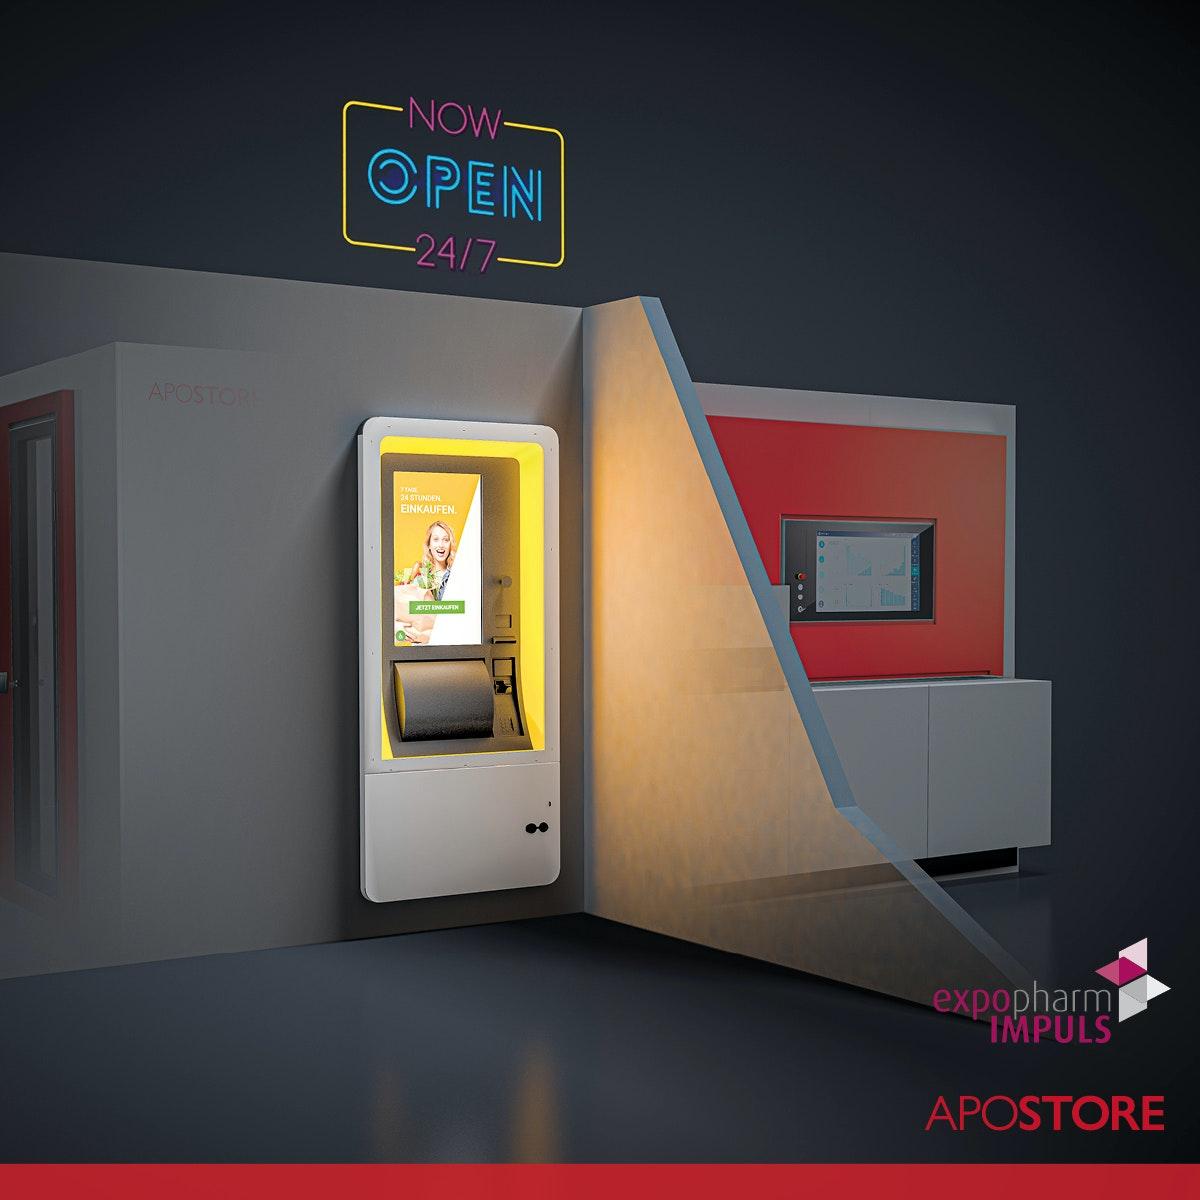 V1 202108 Apostore Kommissionierautomaten Digitale Apotheke expopharm Impuls 2021 24 7 Terminal 1zu1 A